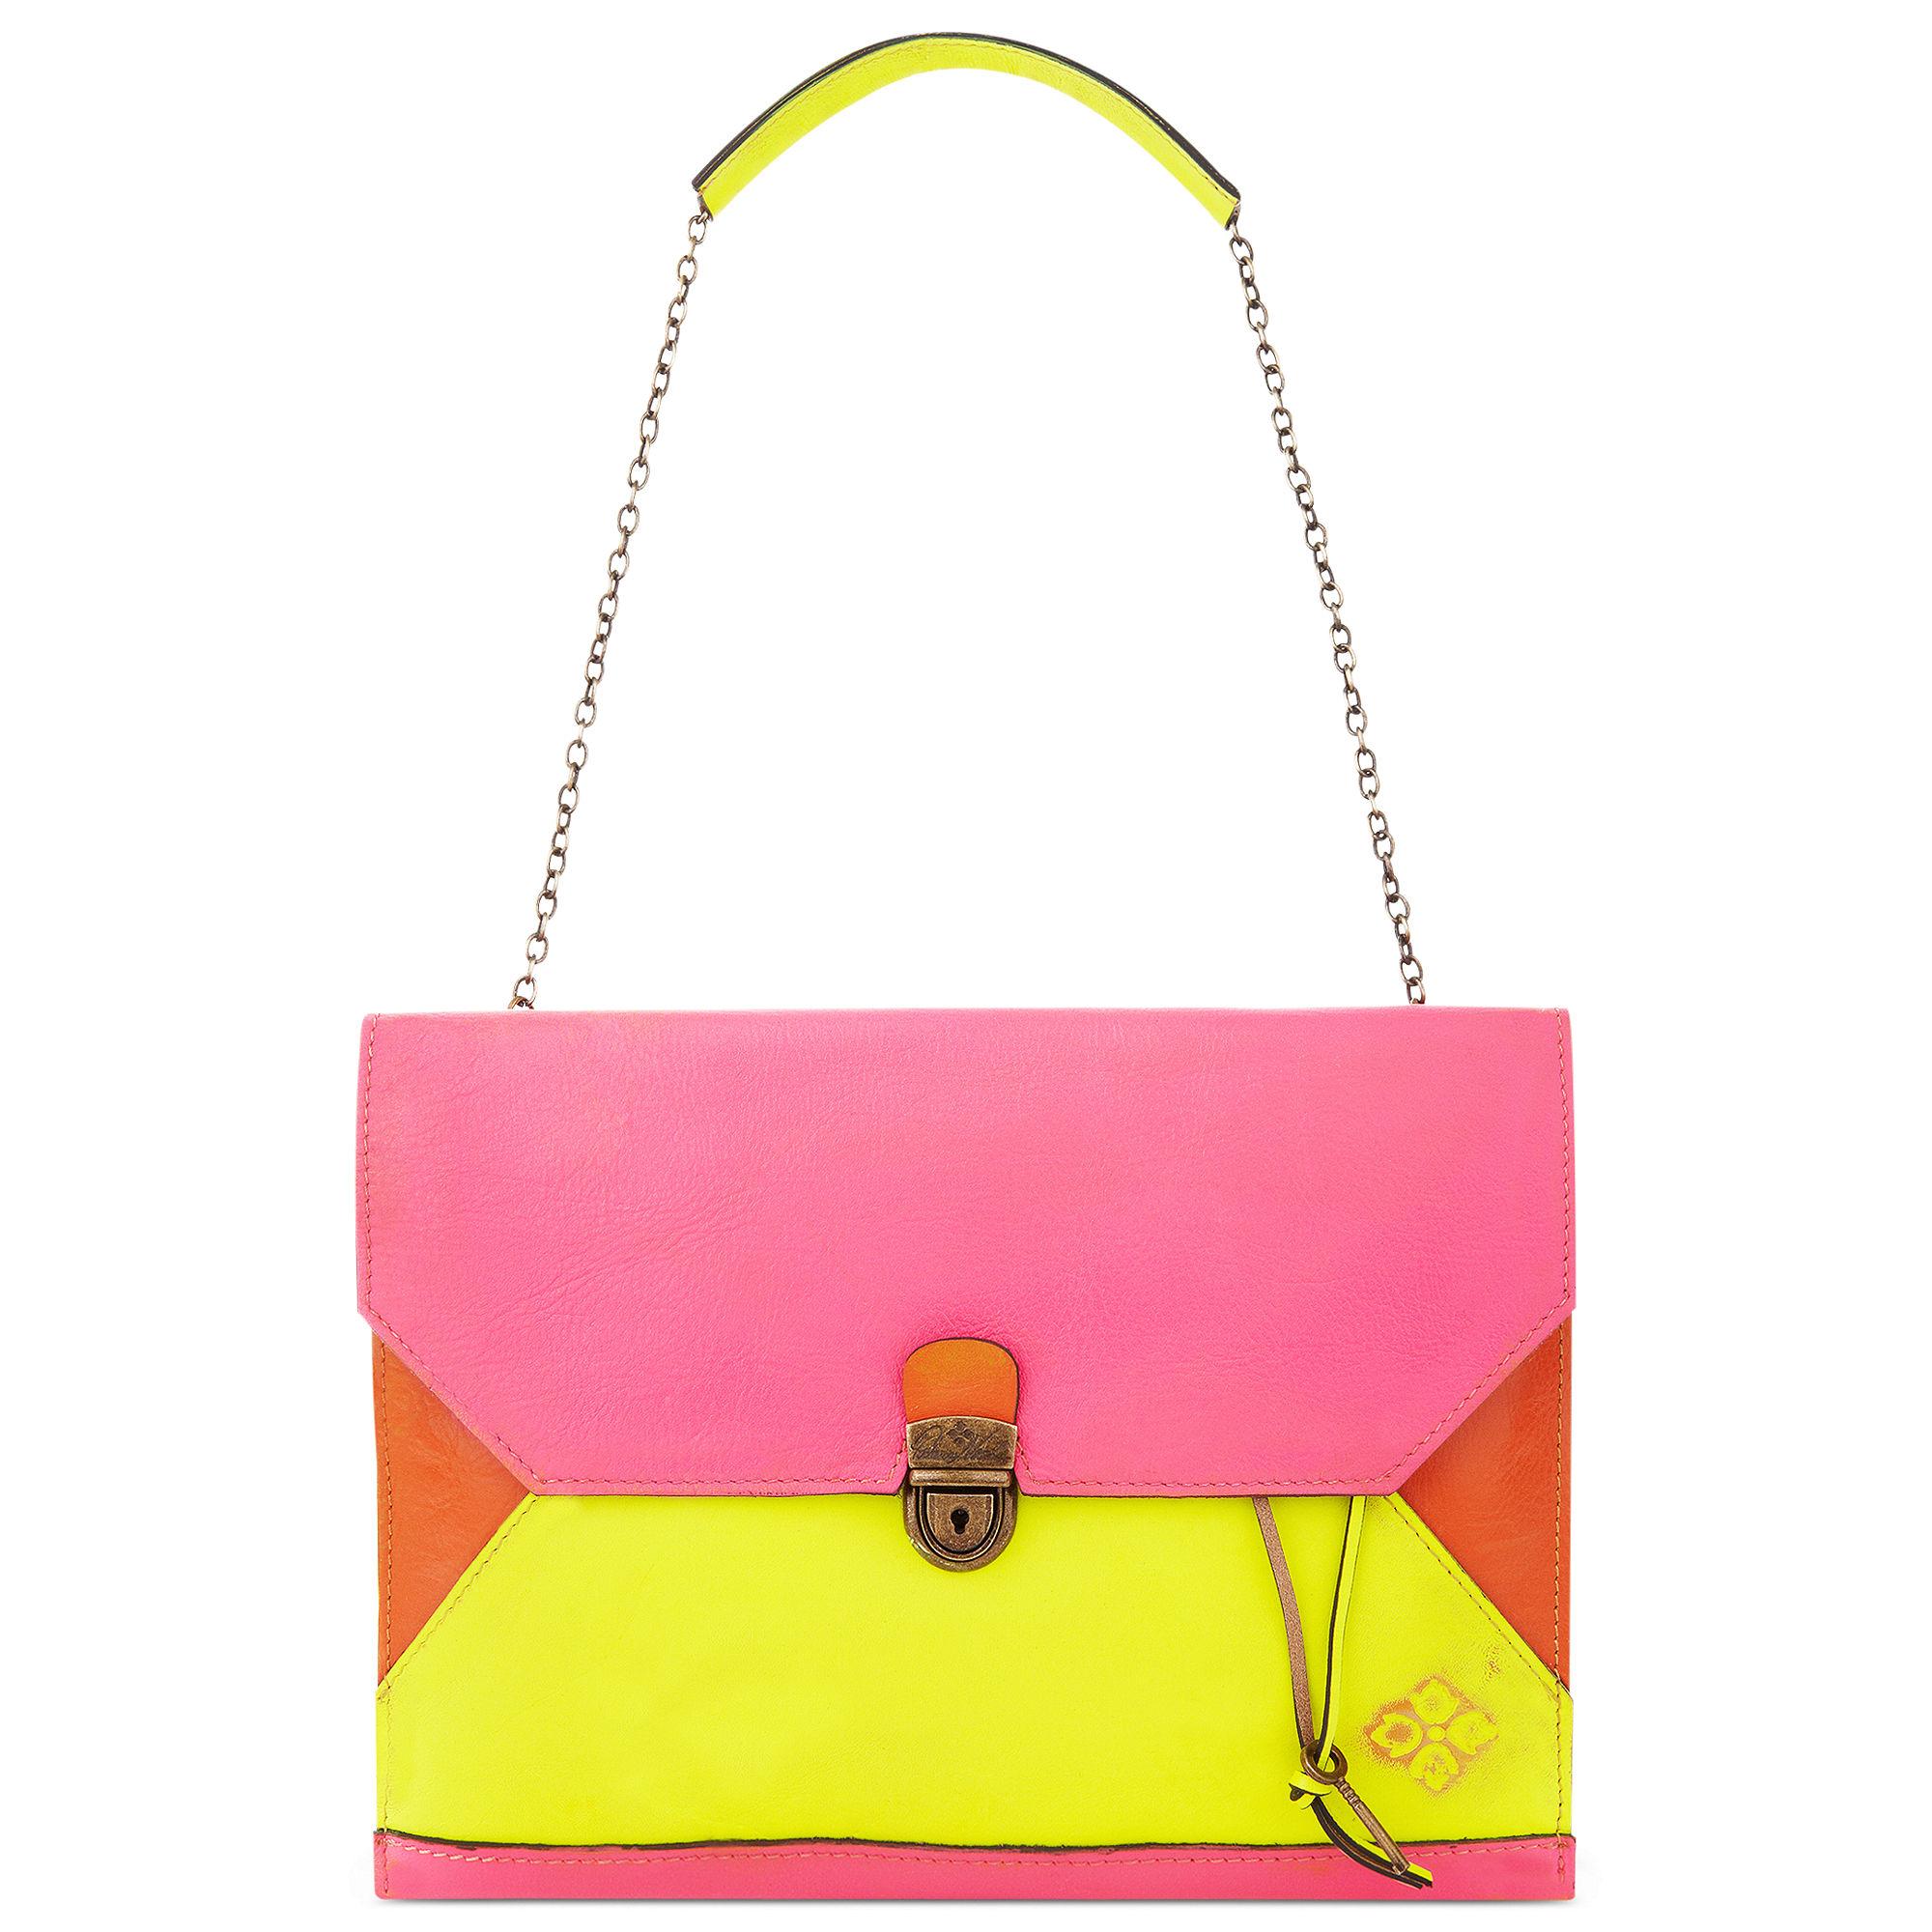 Lyst - Patricia nash Vago Shoulder Bag